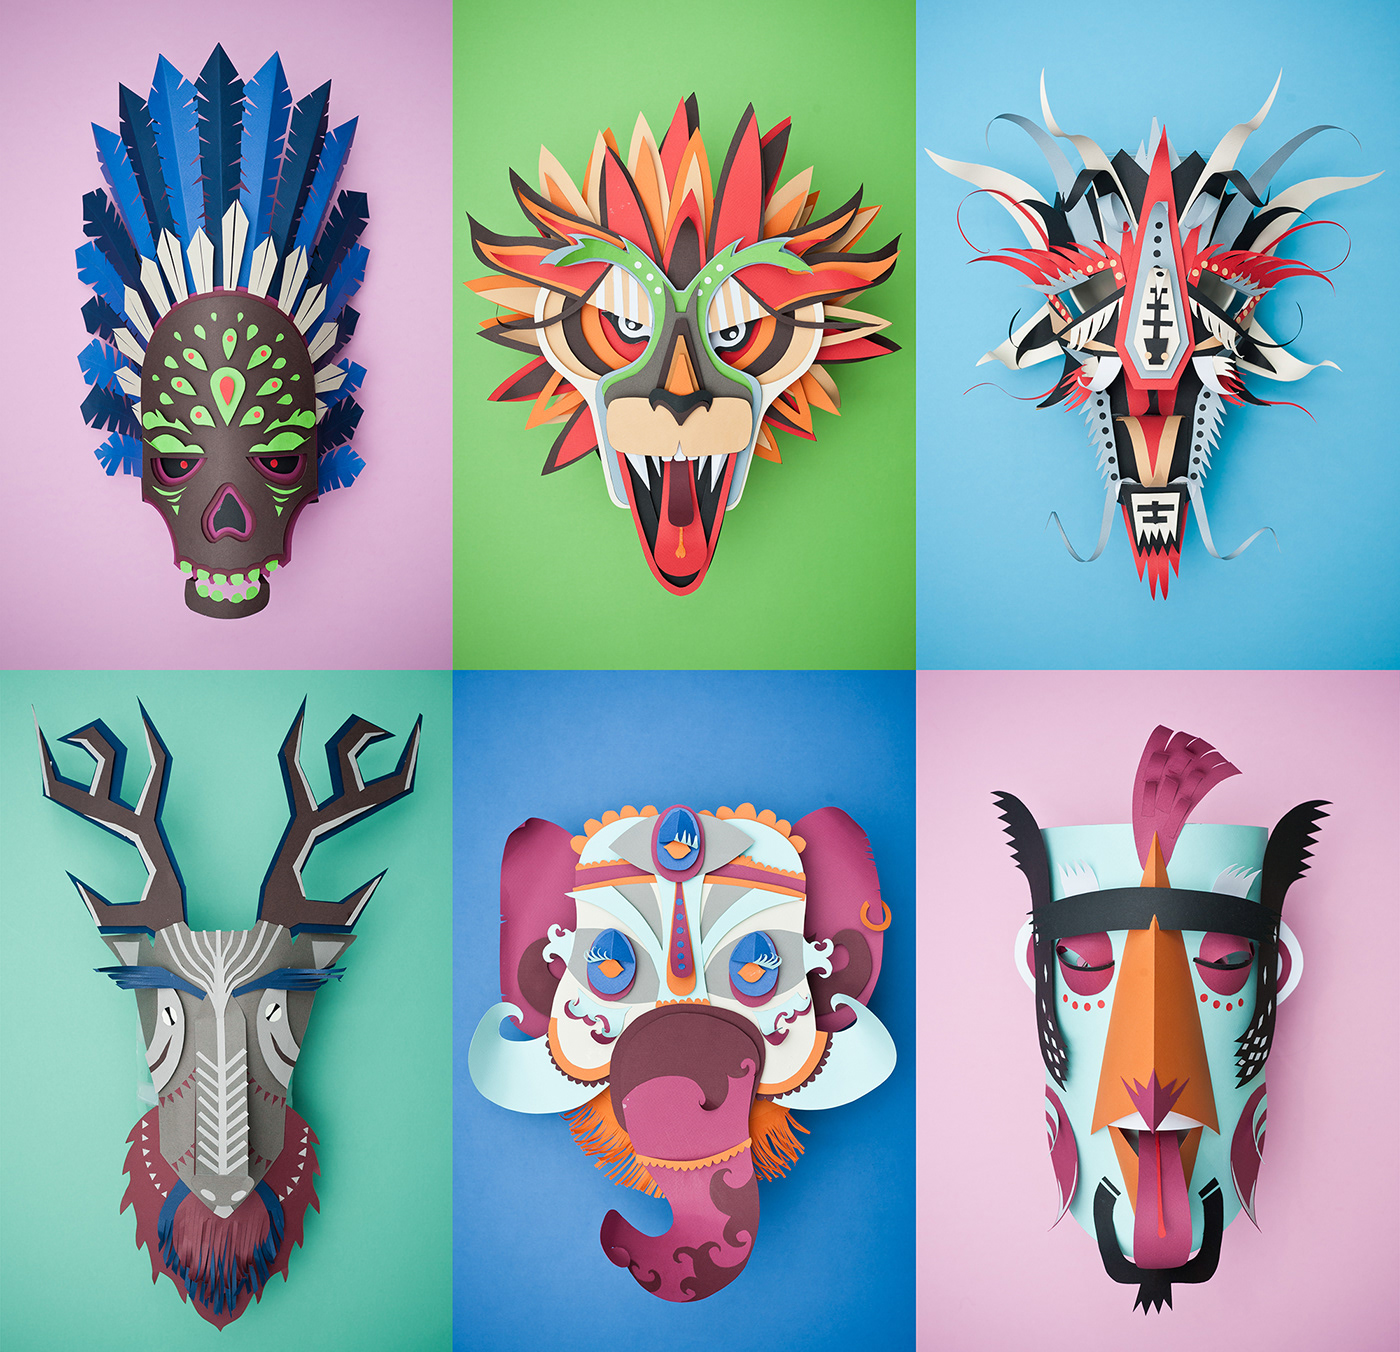 mask creative color colors masks Carnaval fiesta graphic design caracter